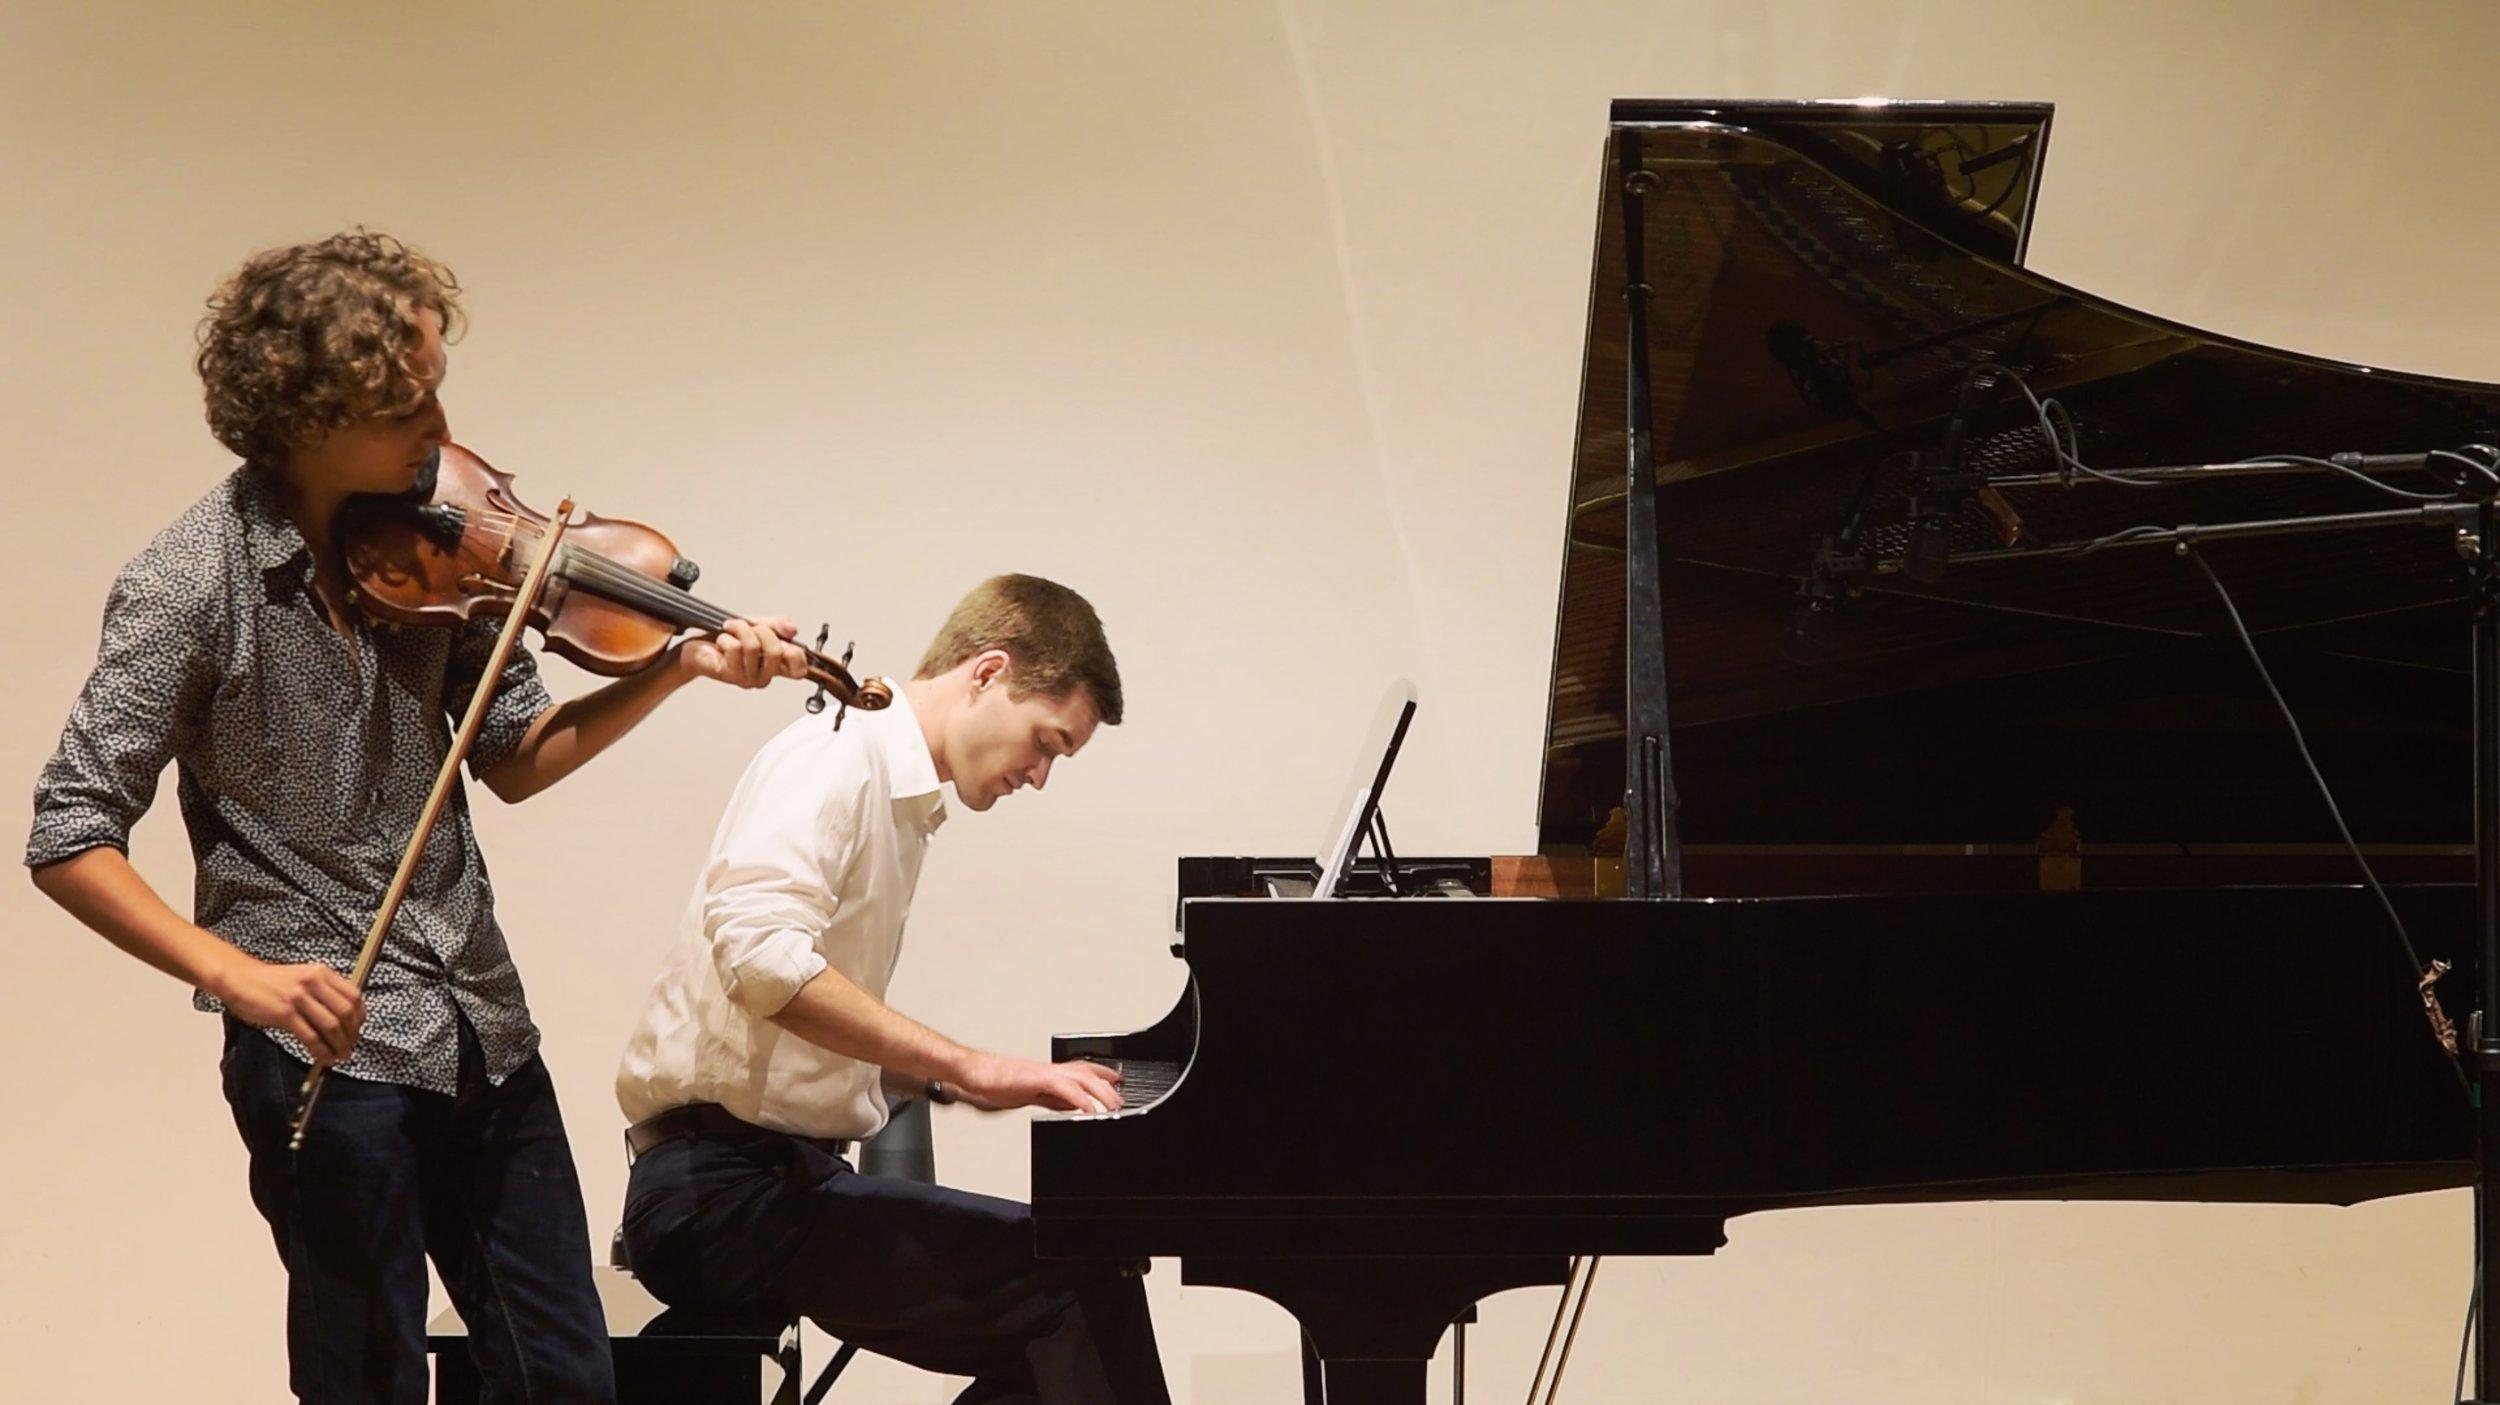 Travis Stright Piano Fiddle.JPG